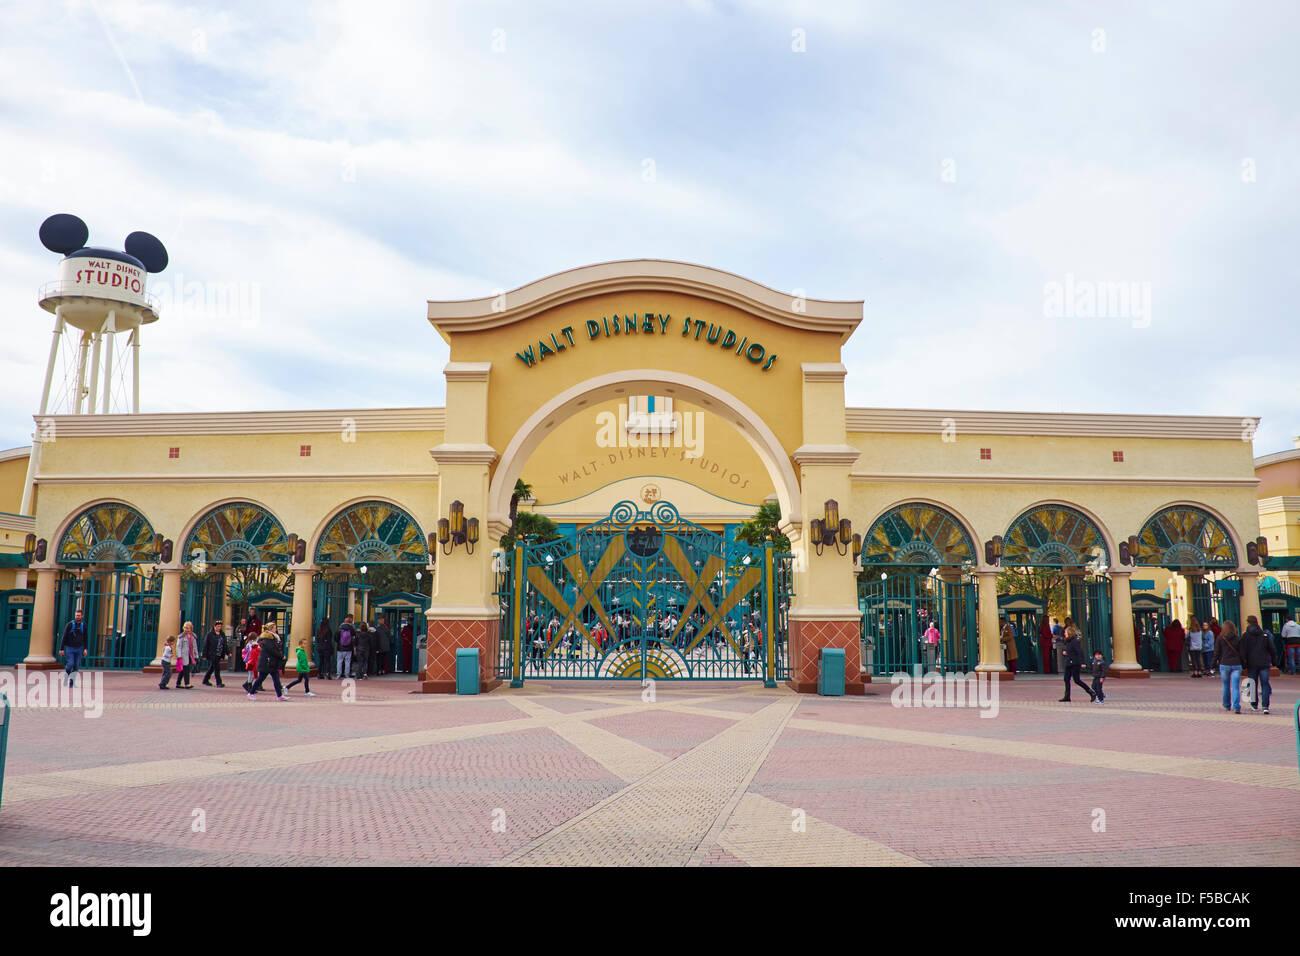 Entrance To Walt Disney Studios Disneyland Paris Marne La